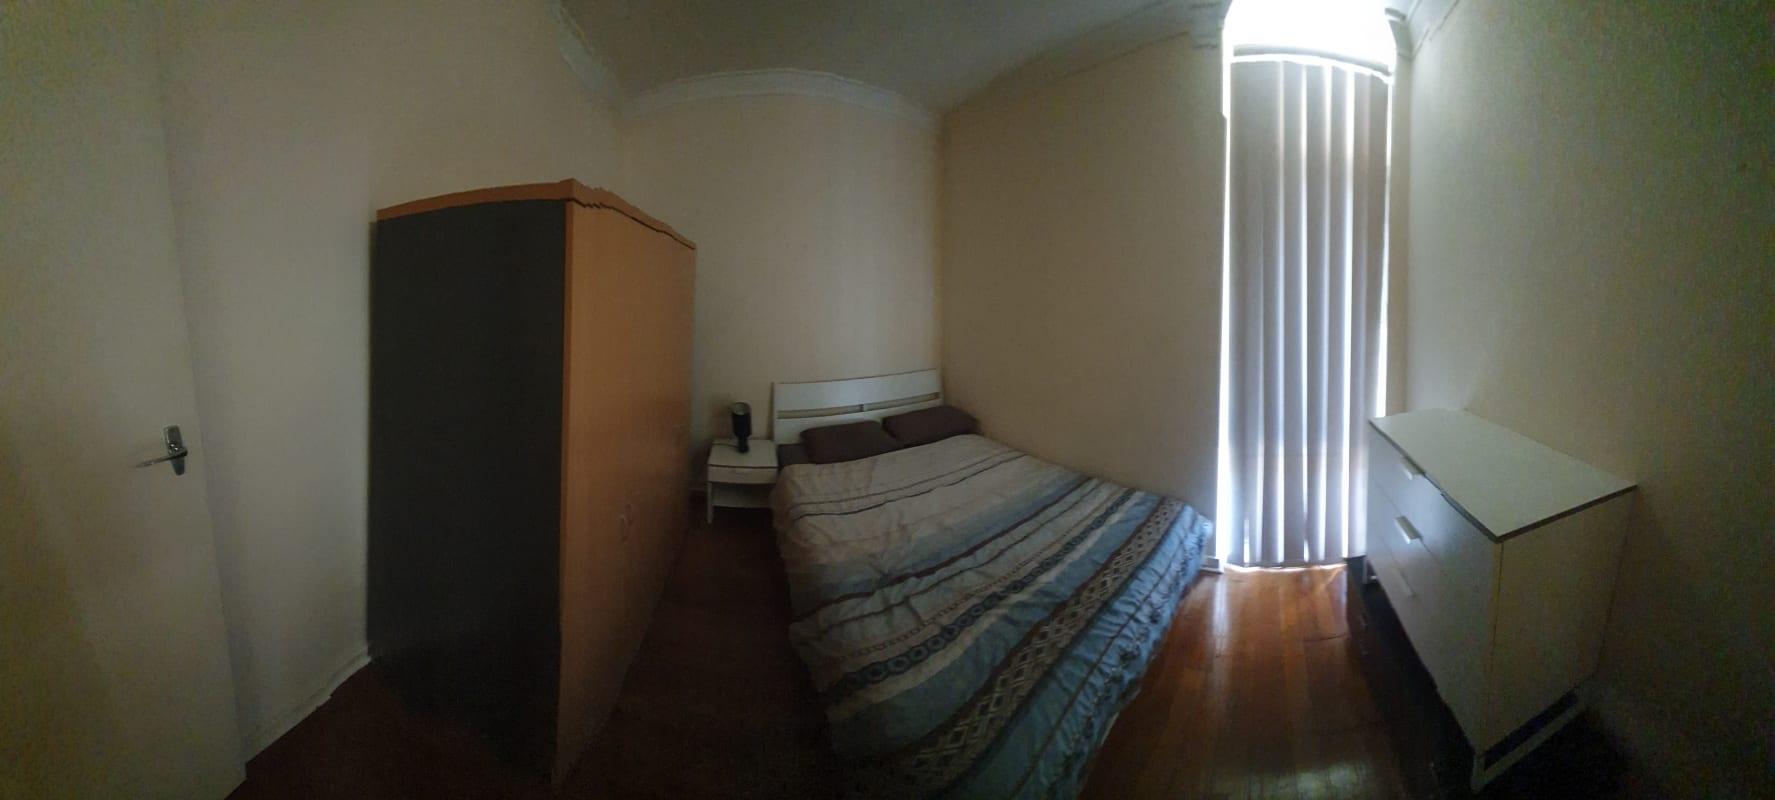 $165, Share-house, 2 bathrooms, Canning Highway, Applecross WA 6153